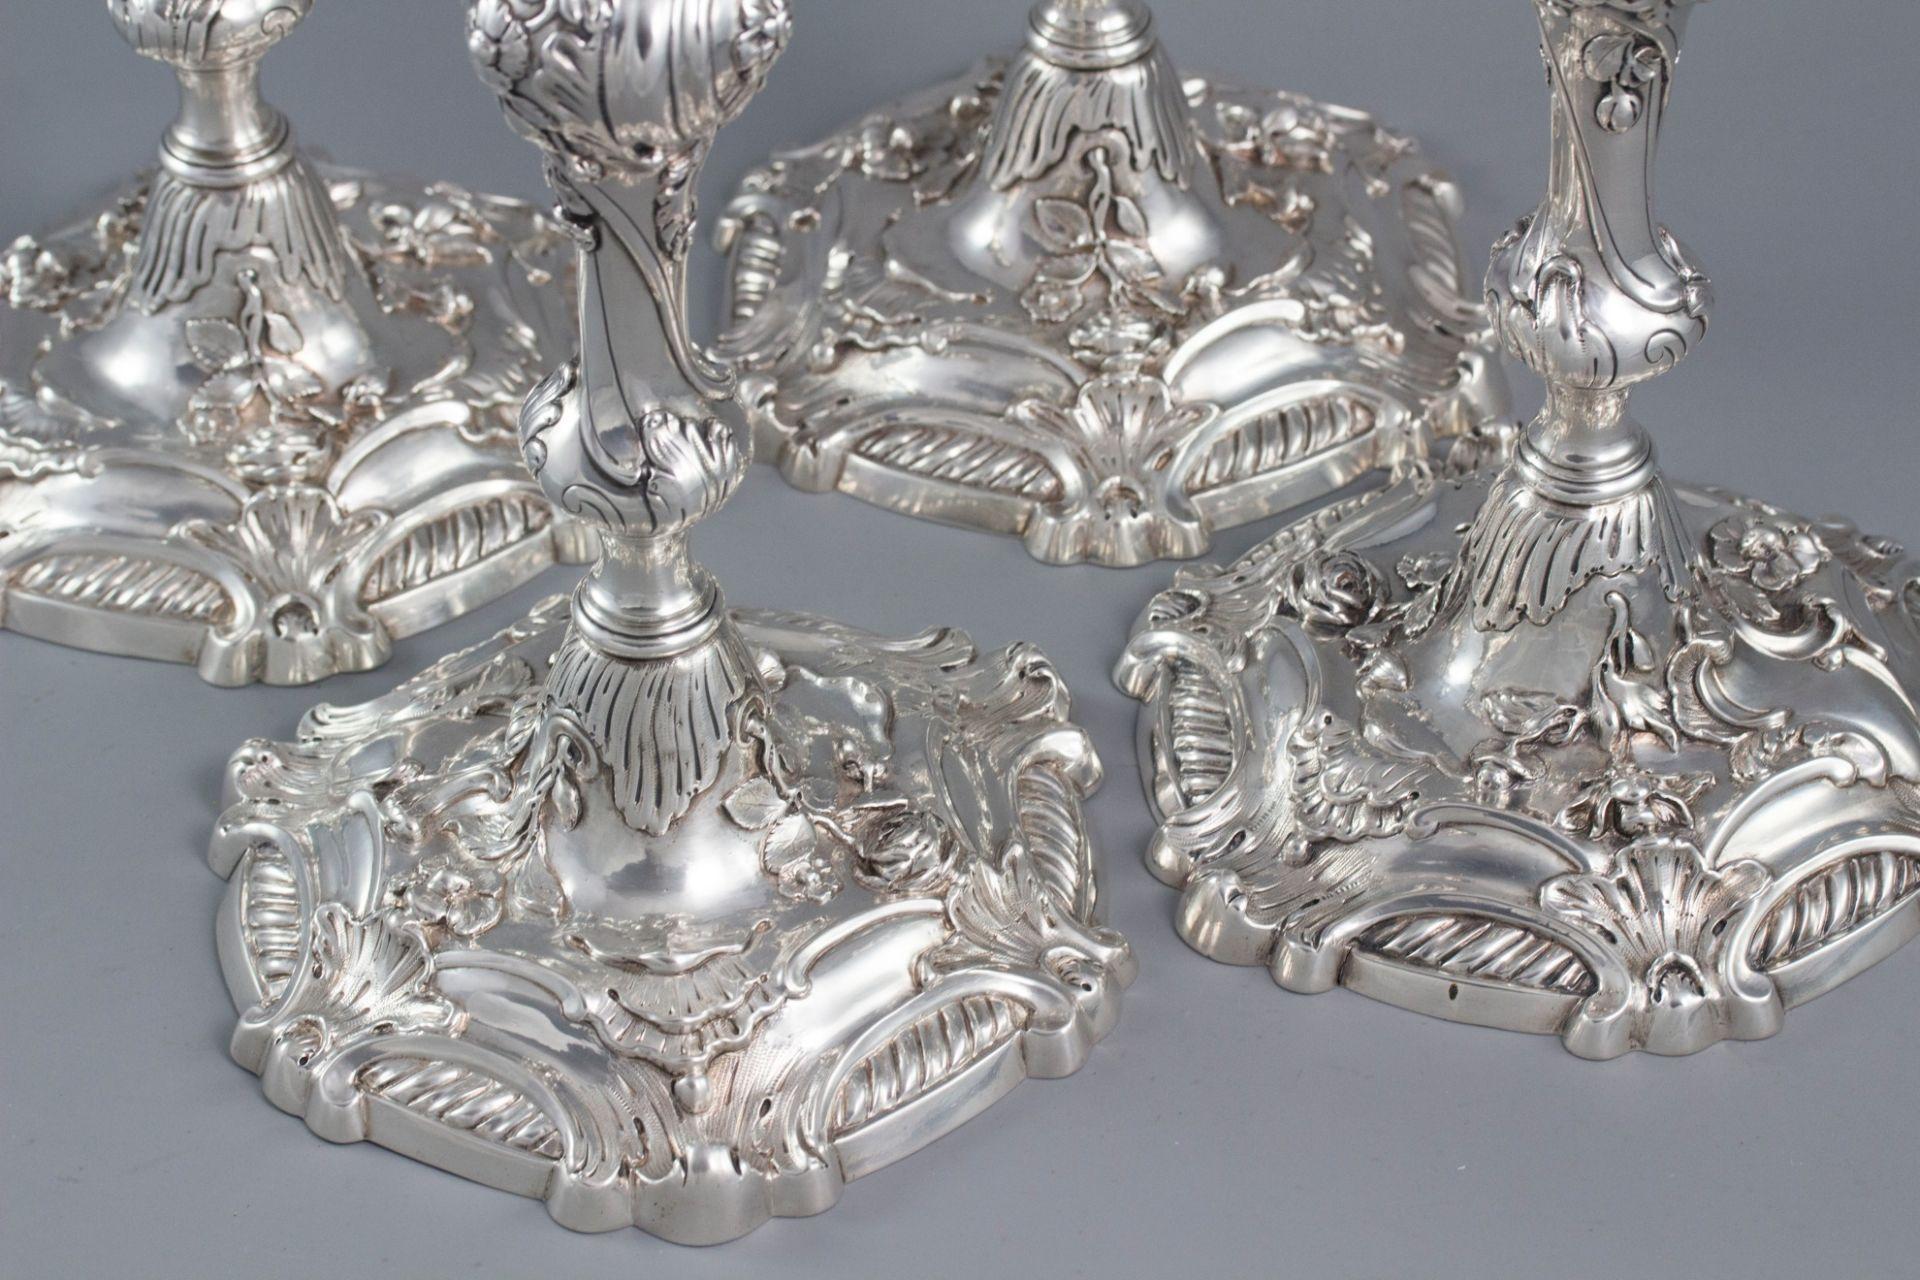 YSL Interest: A set of 4 cast George II Silver Rococo Candlesticks, London 1757